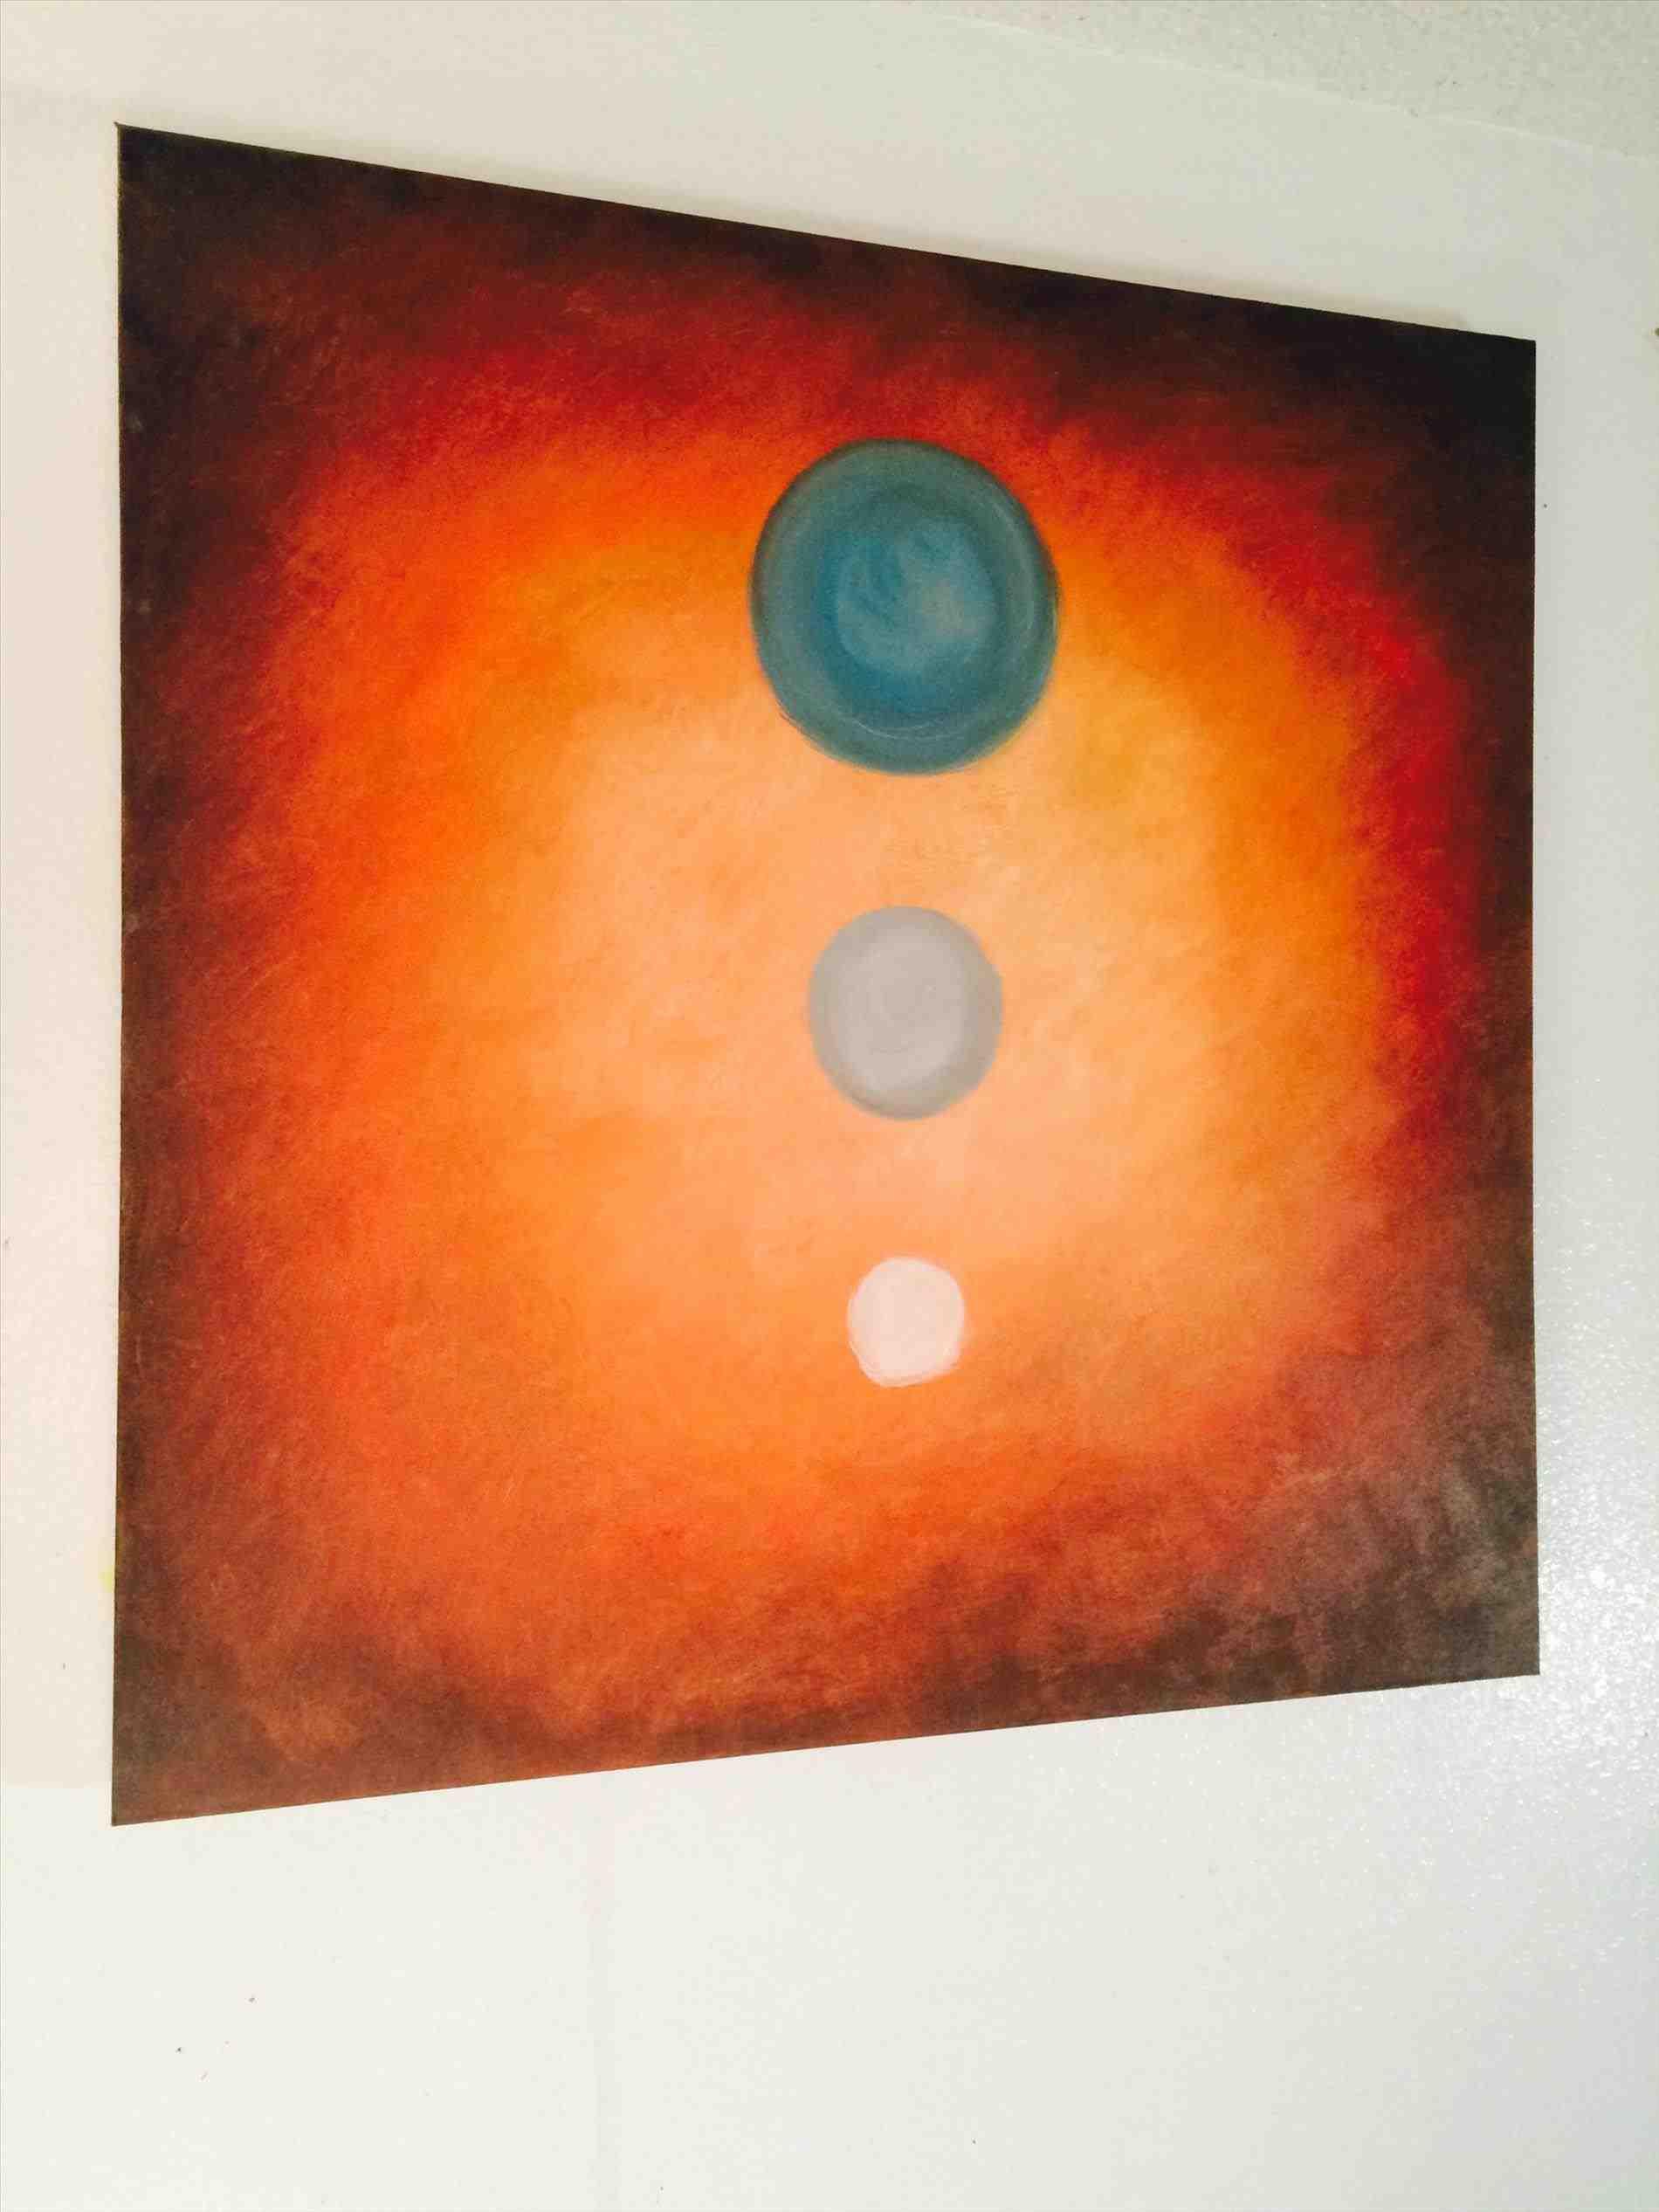 1900x2533 Painting Sunset Abstract Cenornetclub